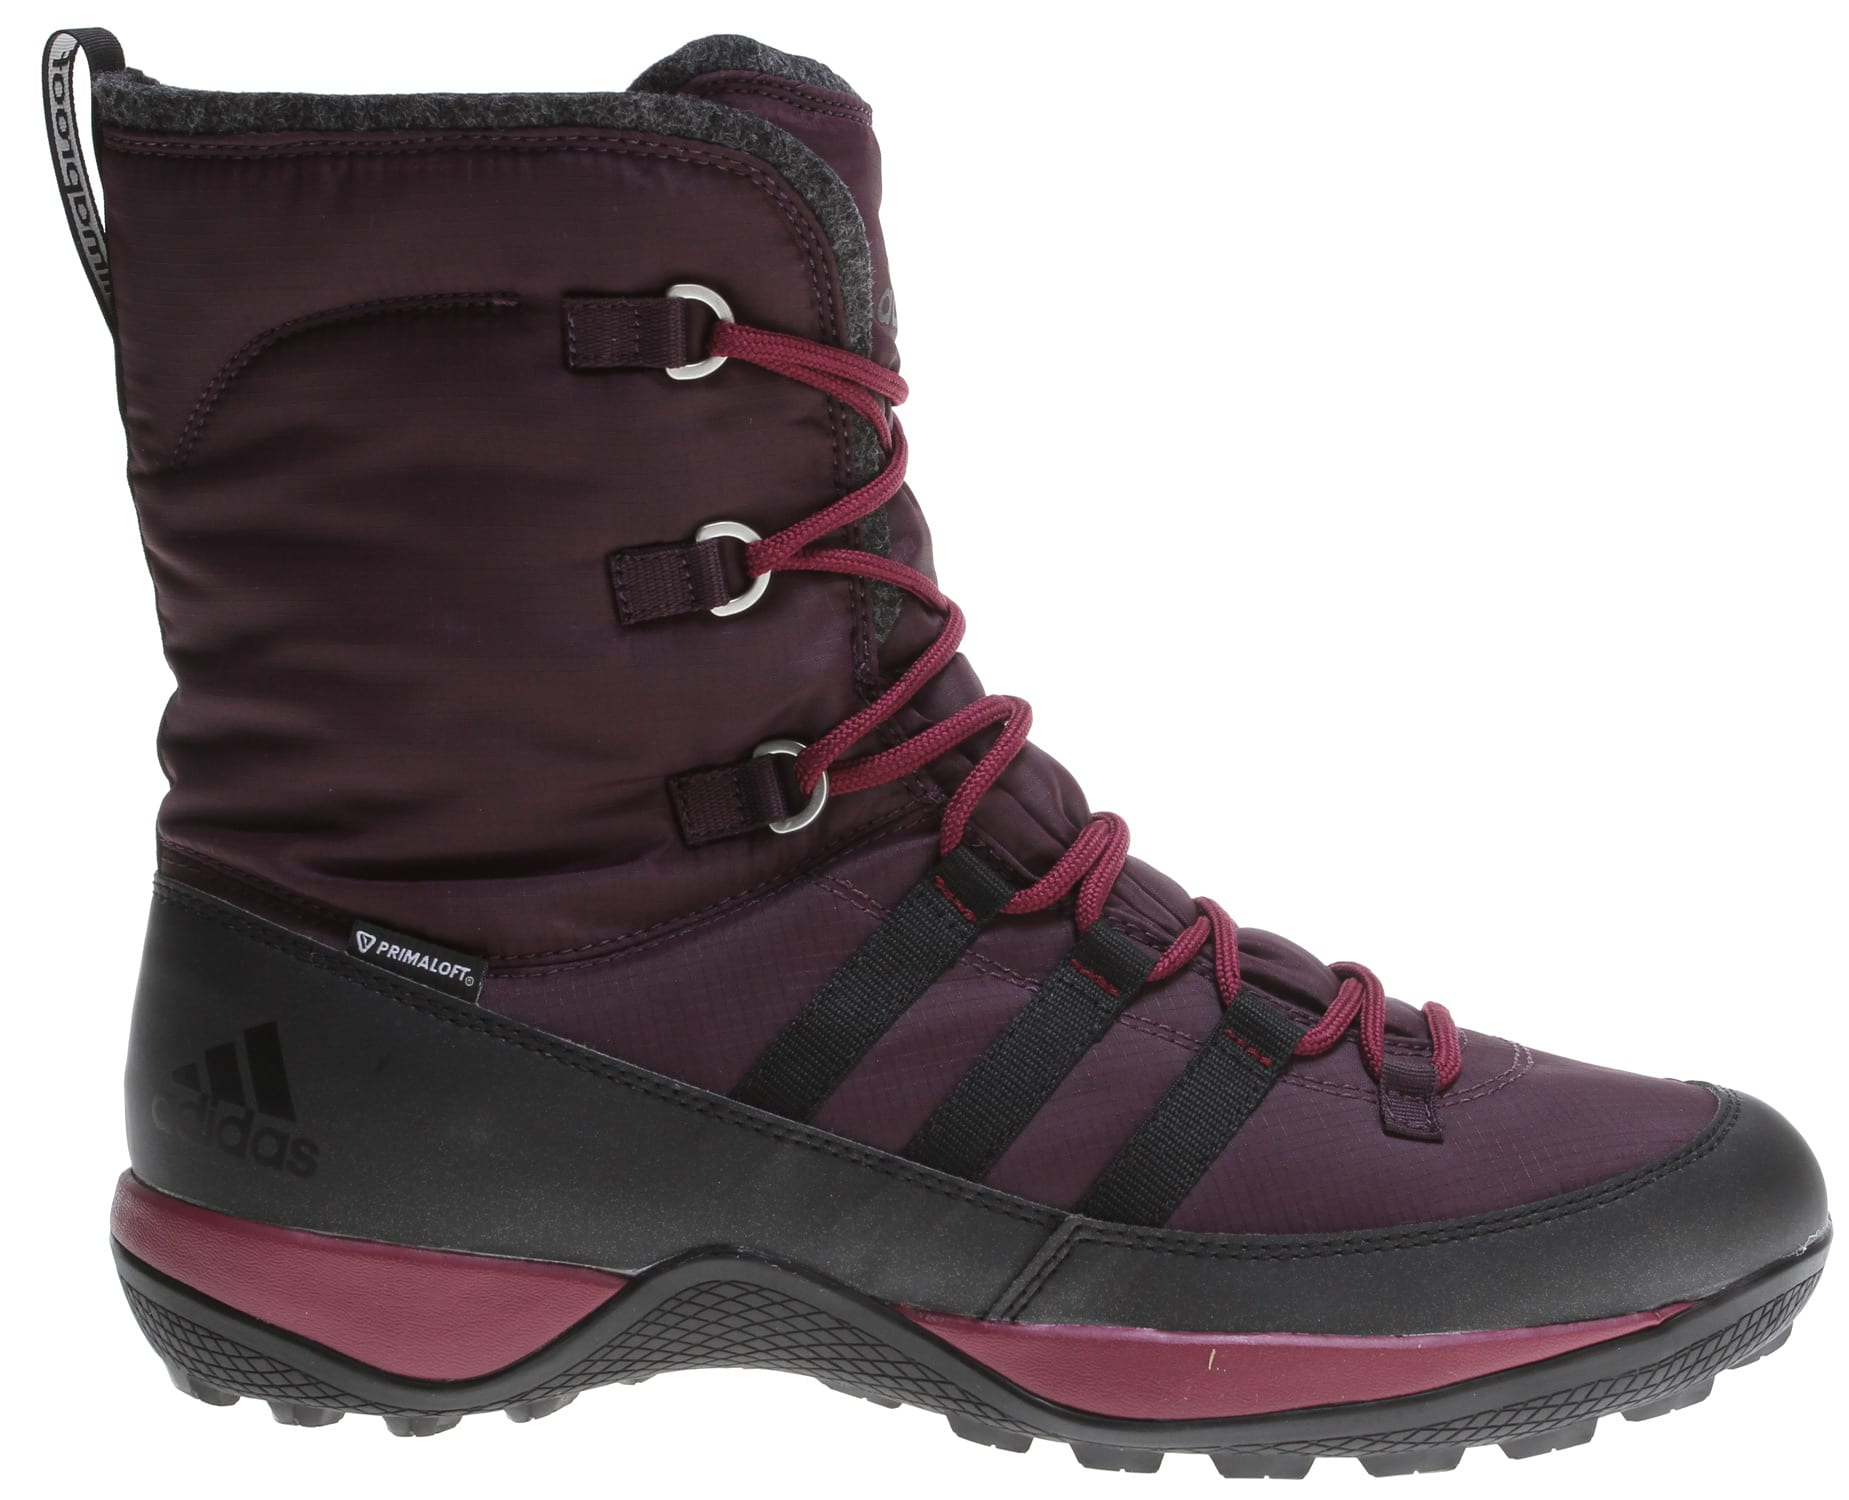 Adidas Libria Pearl CP Primaloft Boots - thumbnail 1